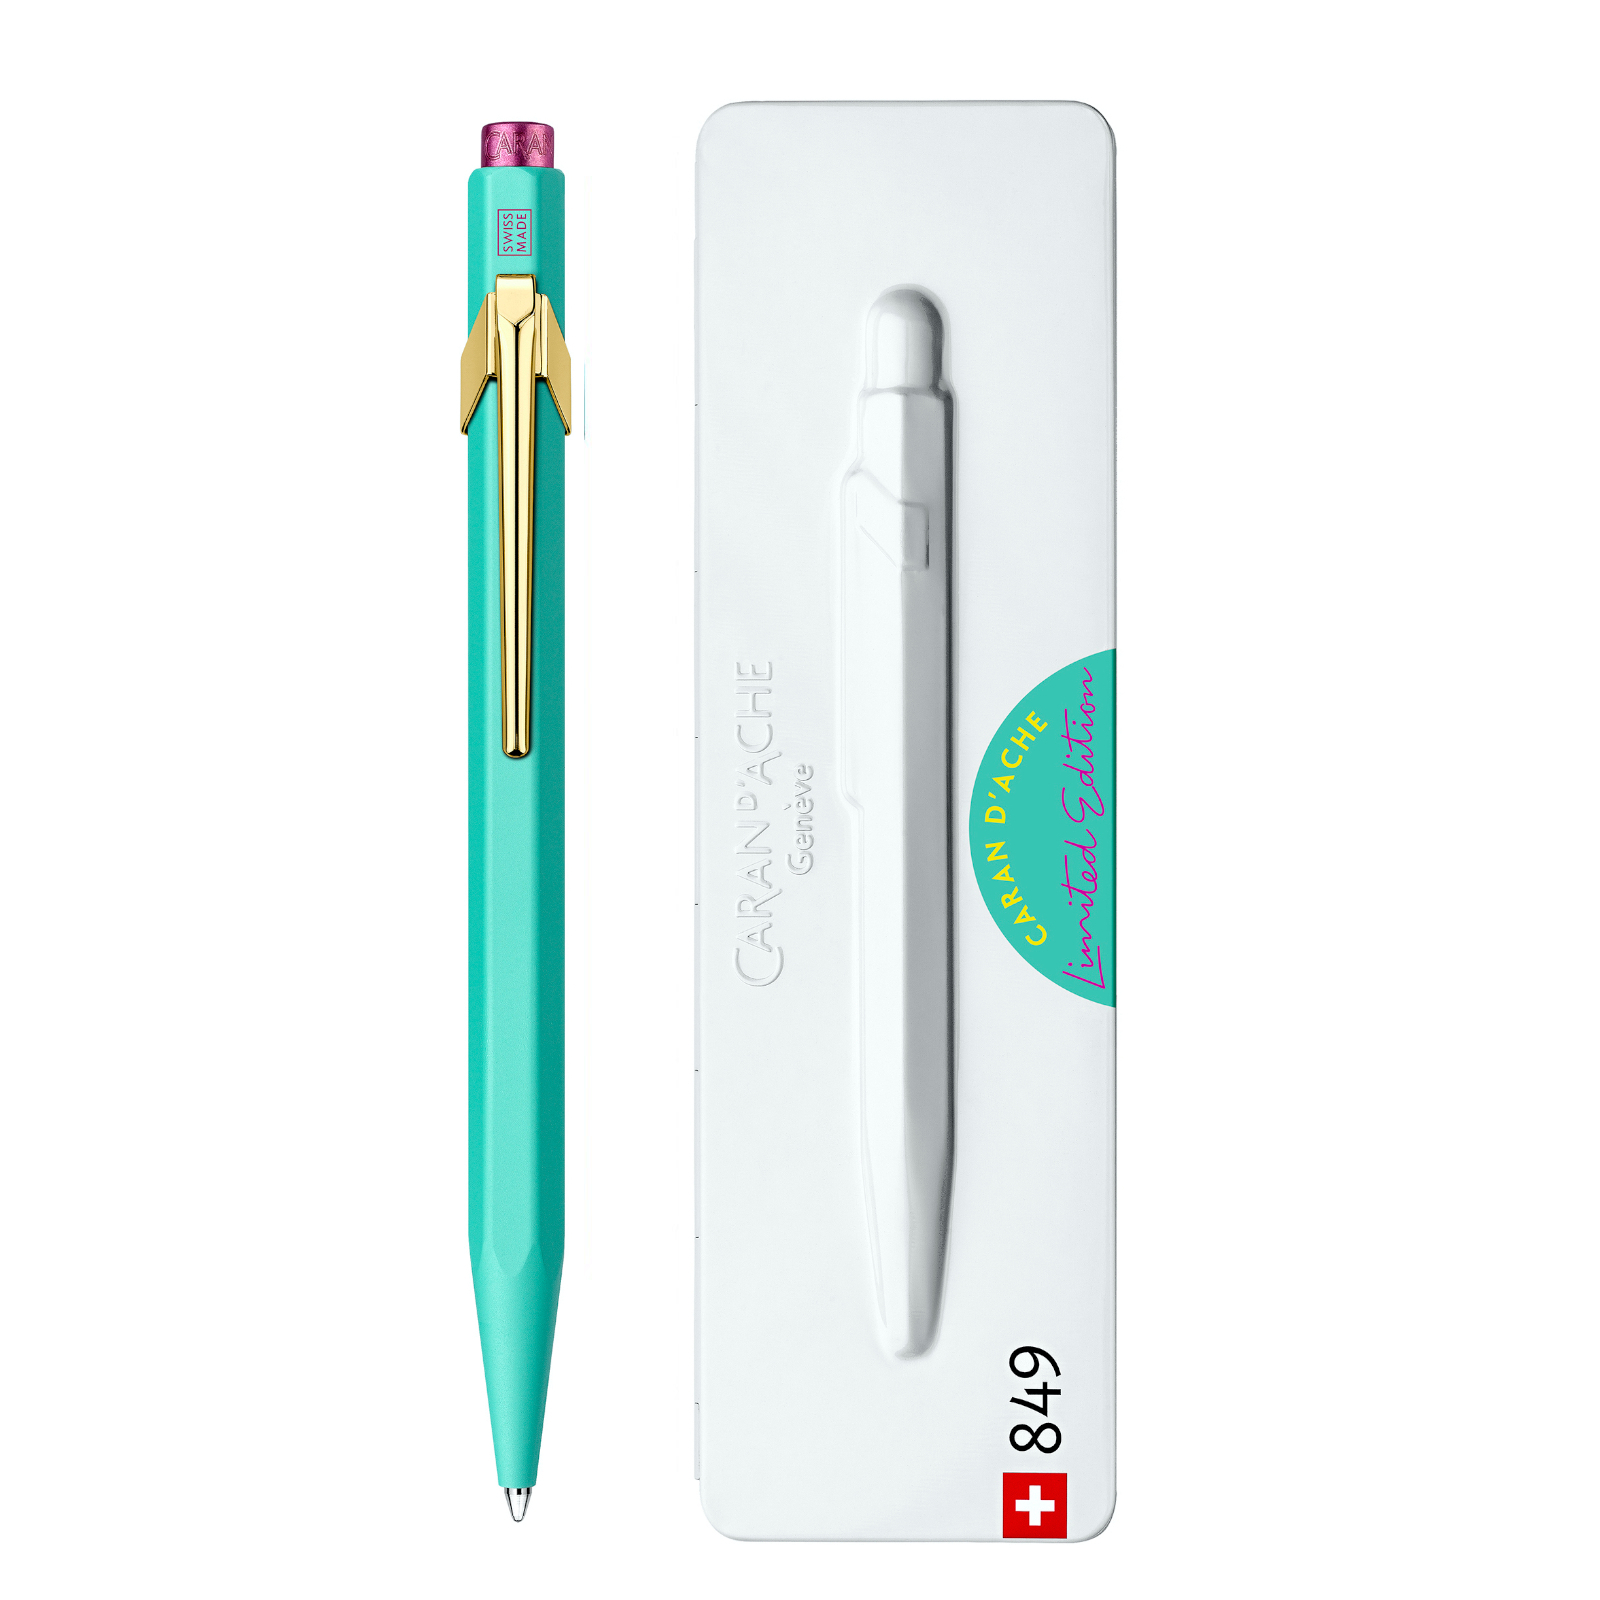 Ручка Caran d'Ache 849 Claim Your Style Бірюзова + box